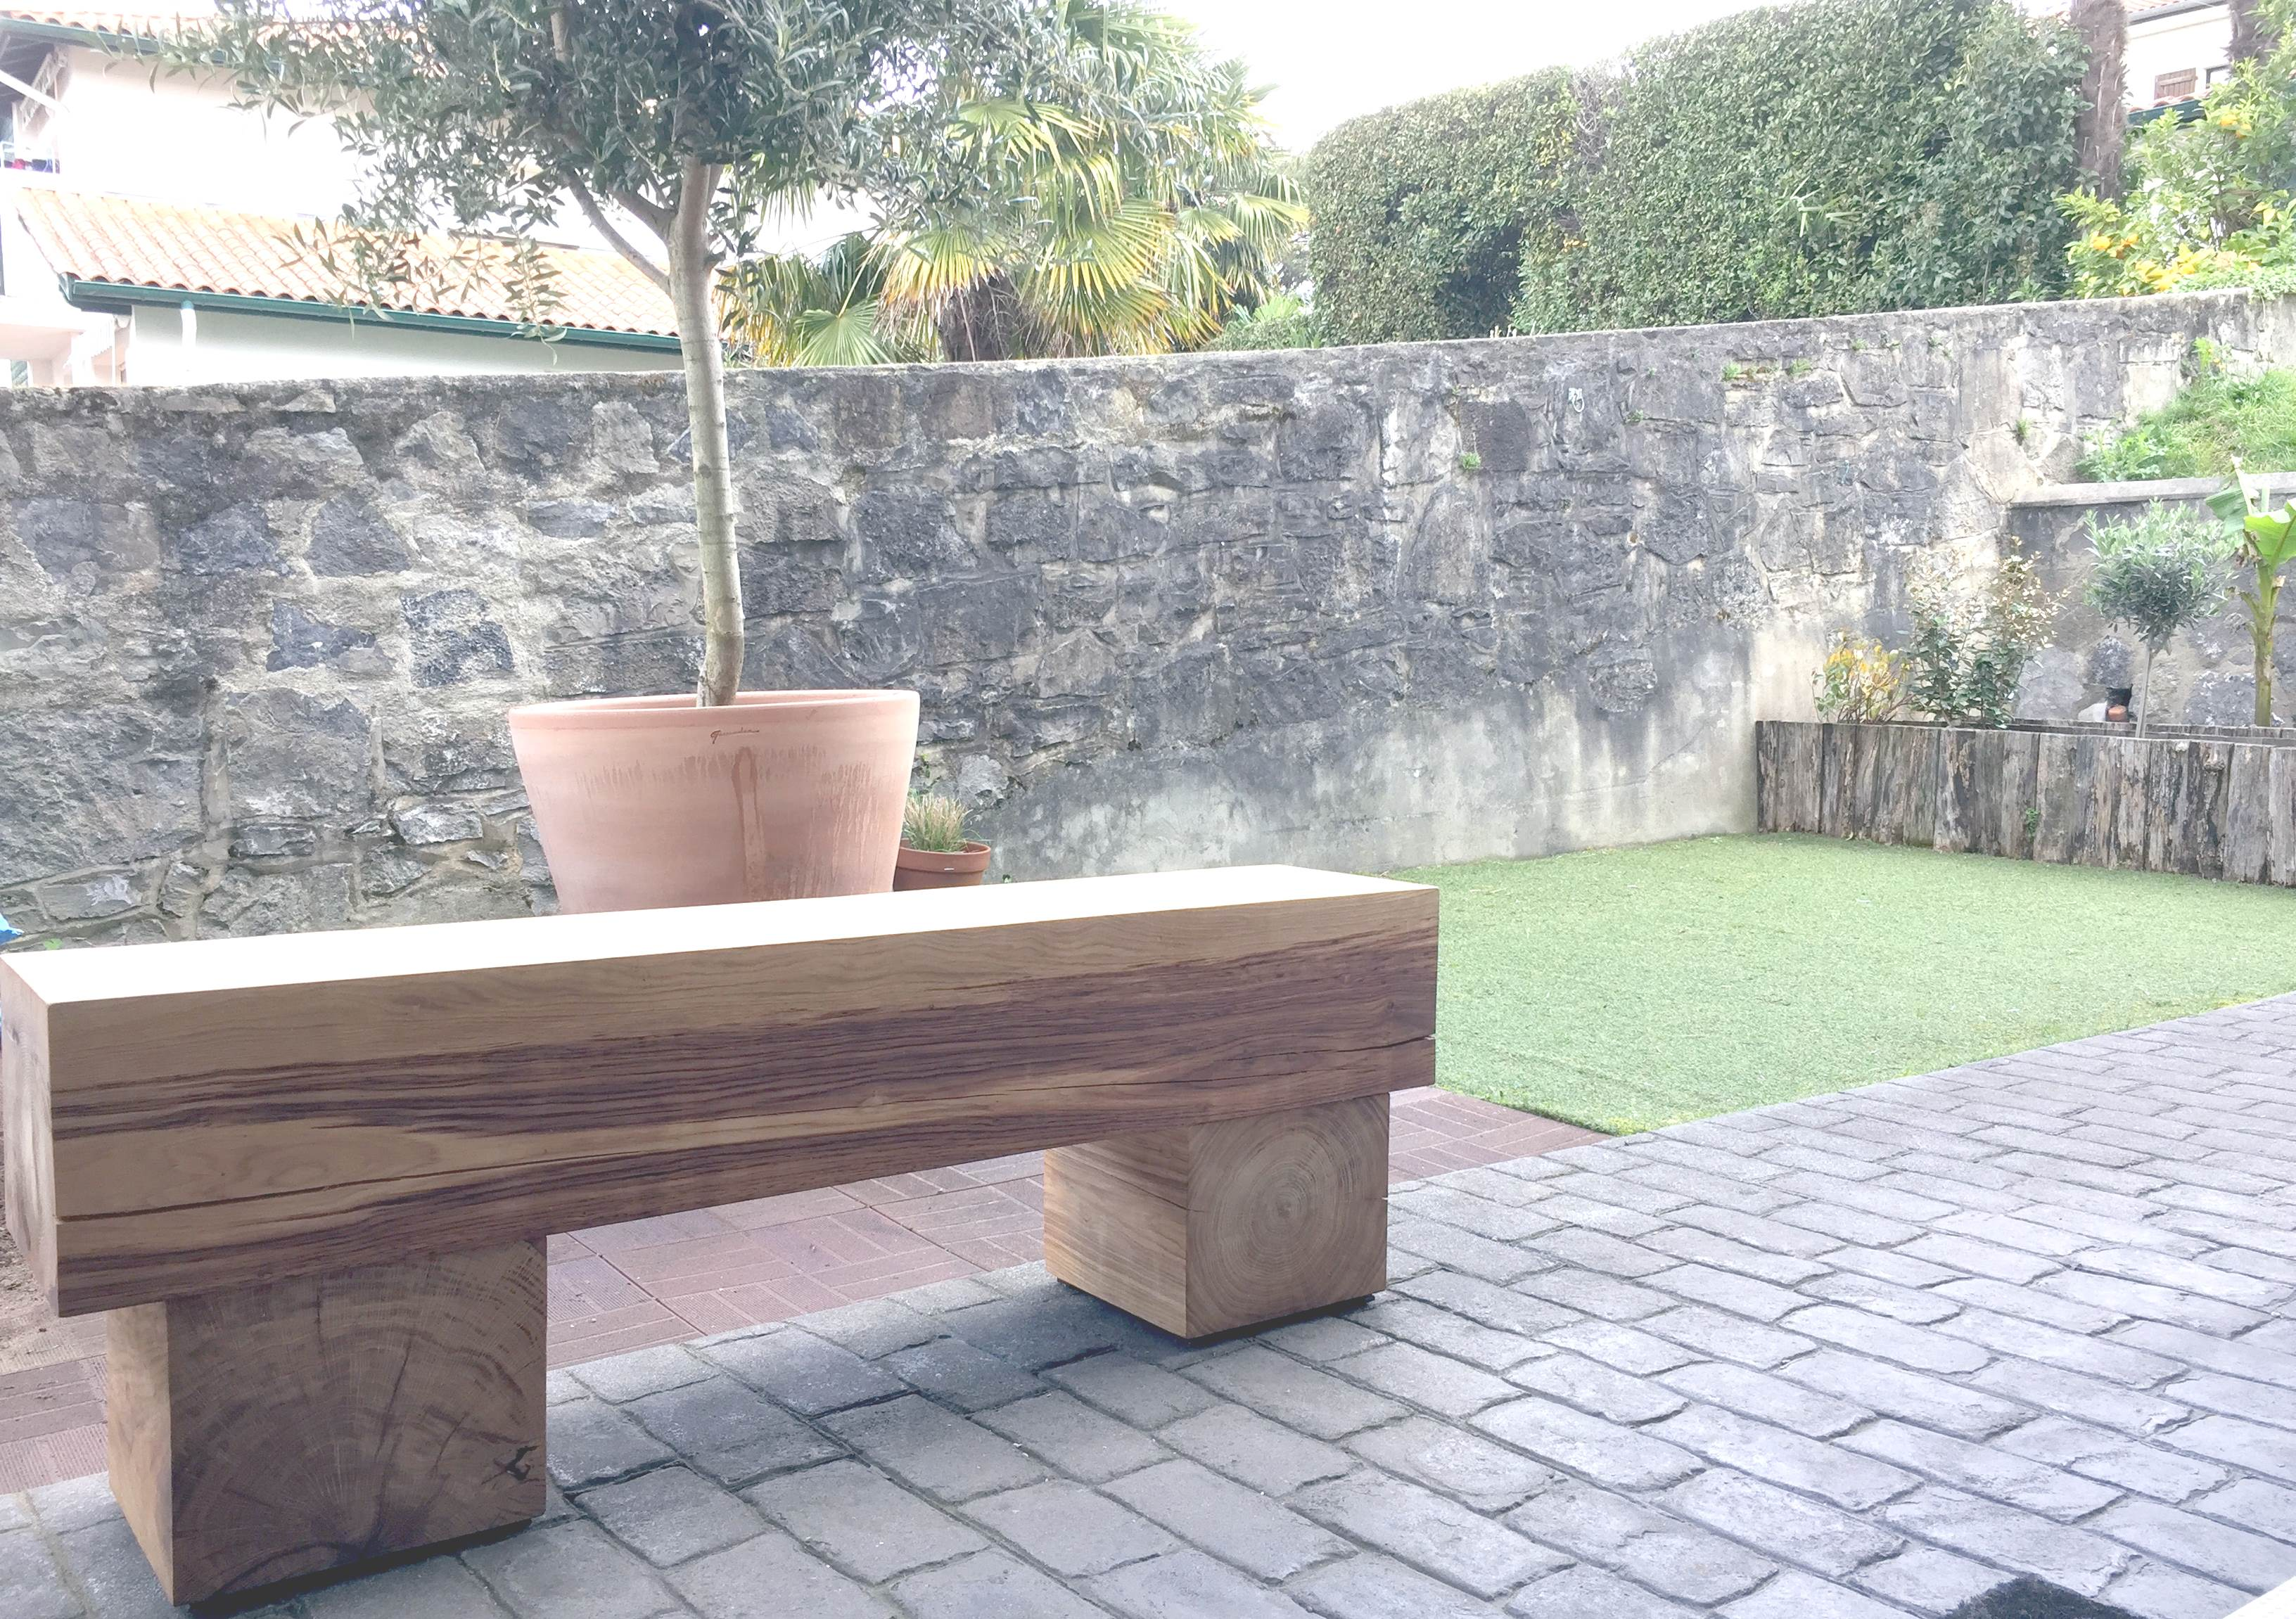 cr ations bois darrieumerlou banc bois ch ne massif. Black Bedroom Furniture Sets. Home Design Ideas